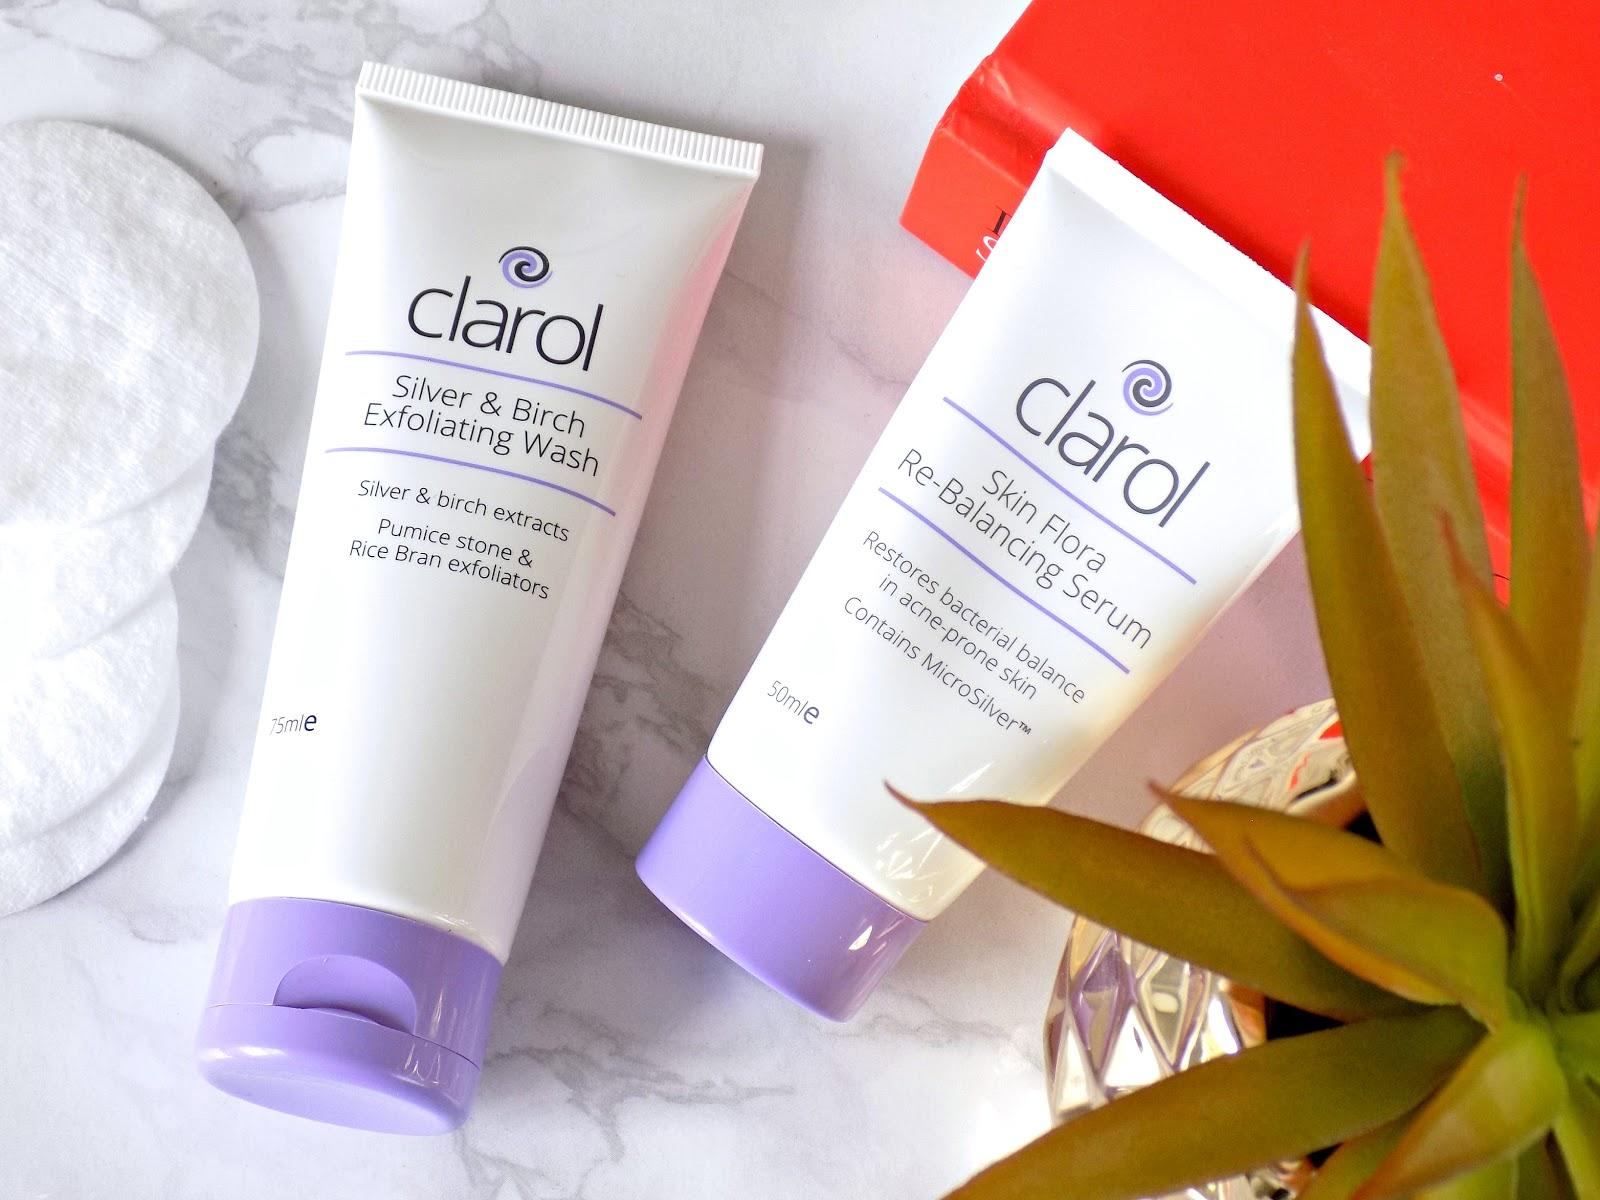 Clarol Skin Flora Re-Balancing Serum, Silver & Birch Exfoliating Wash